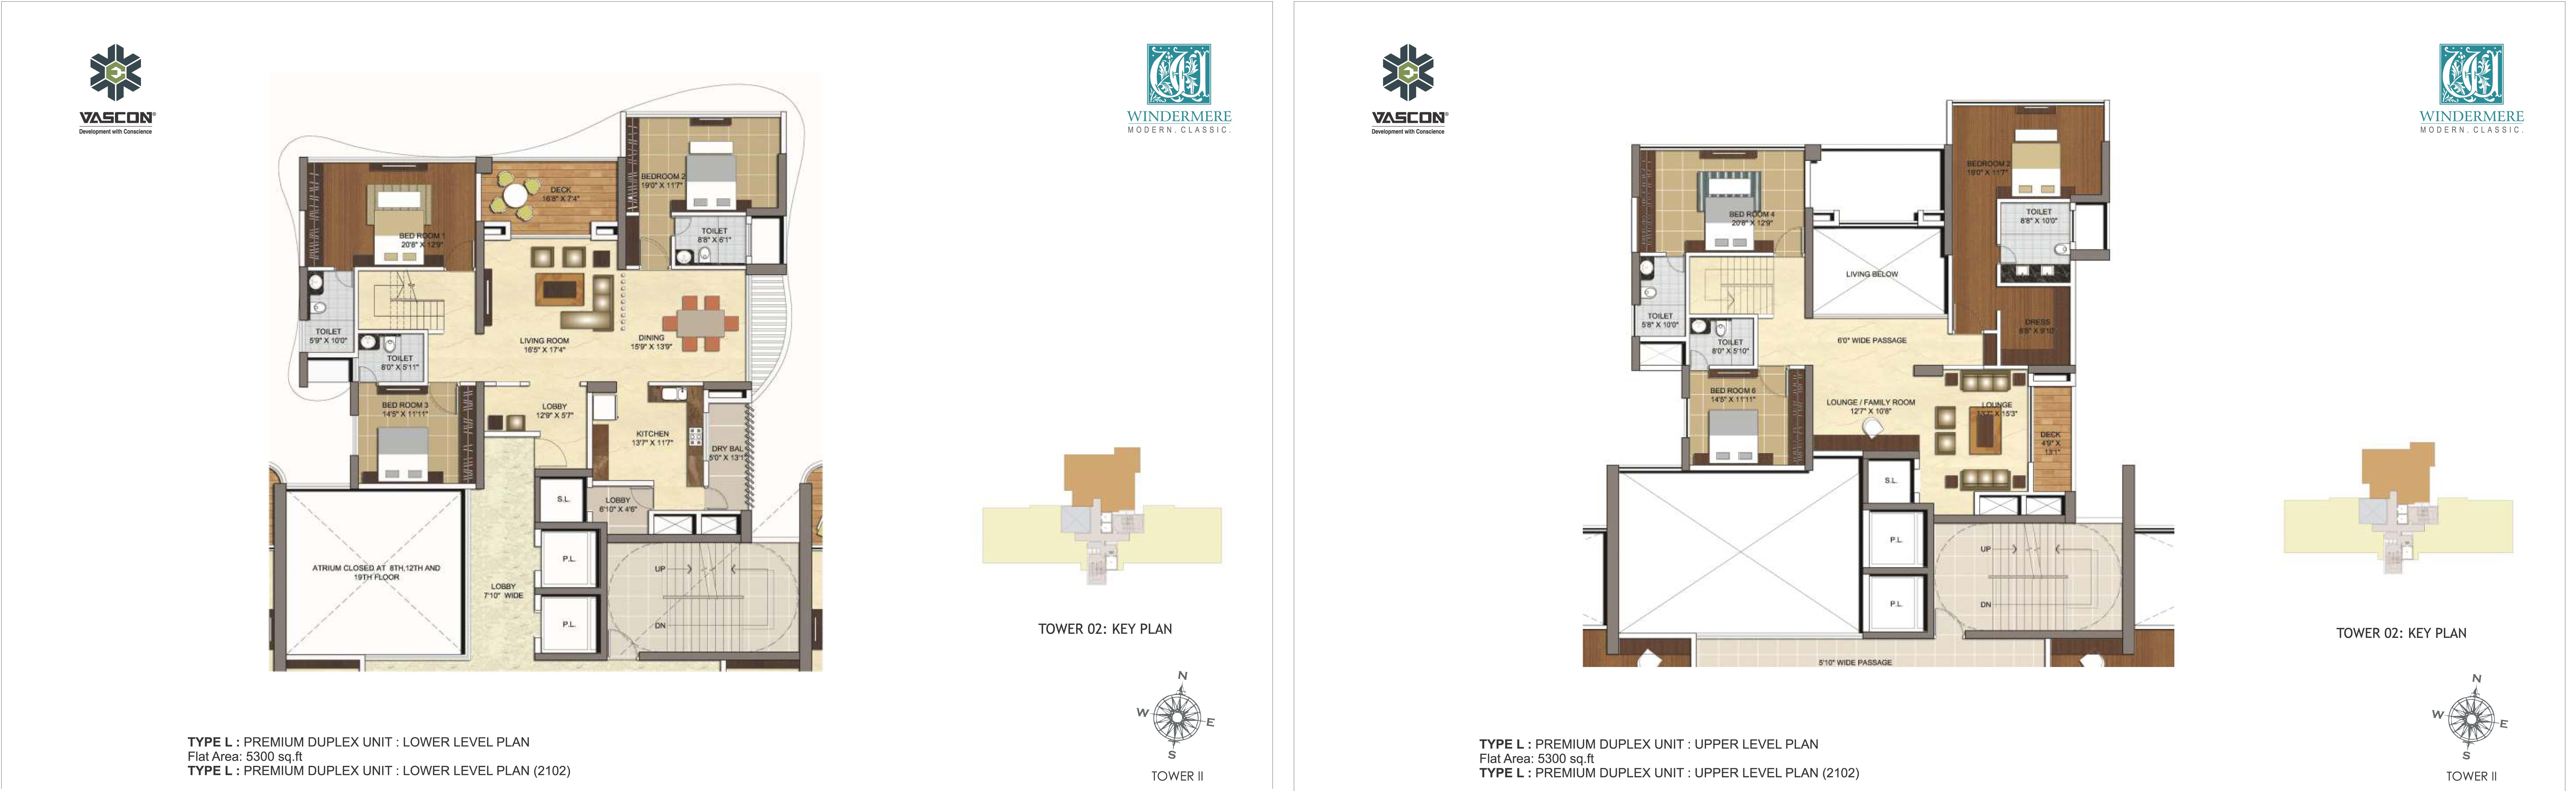 vascon windermere apartment 5bhk 5300sqft1